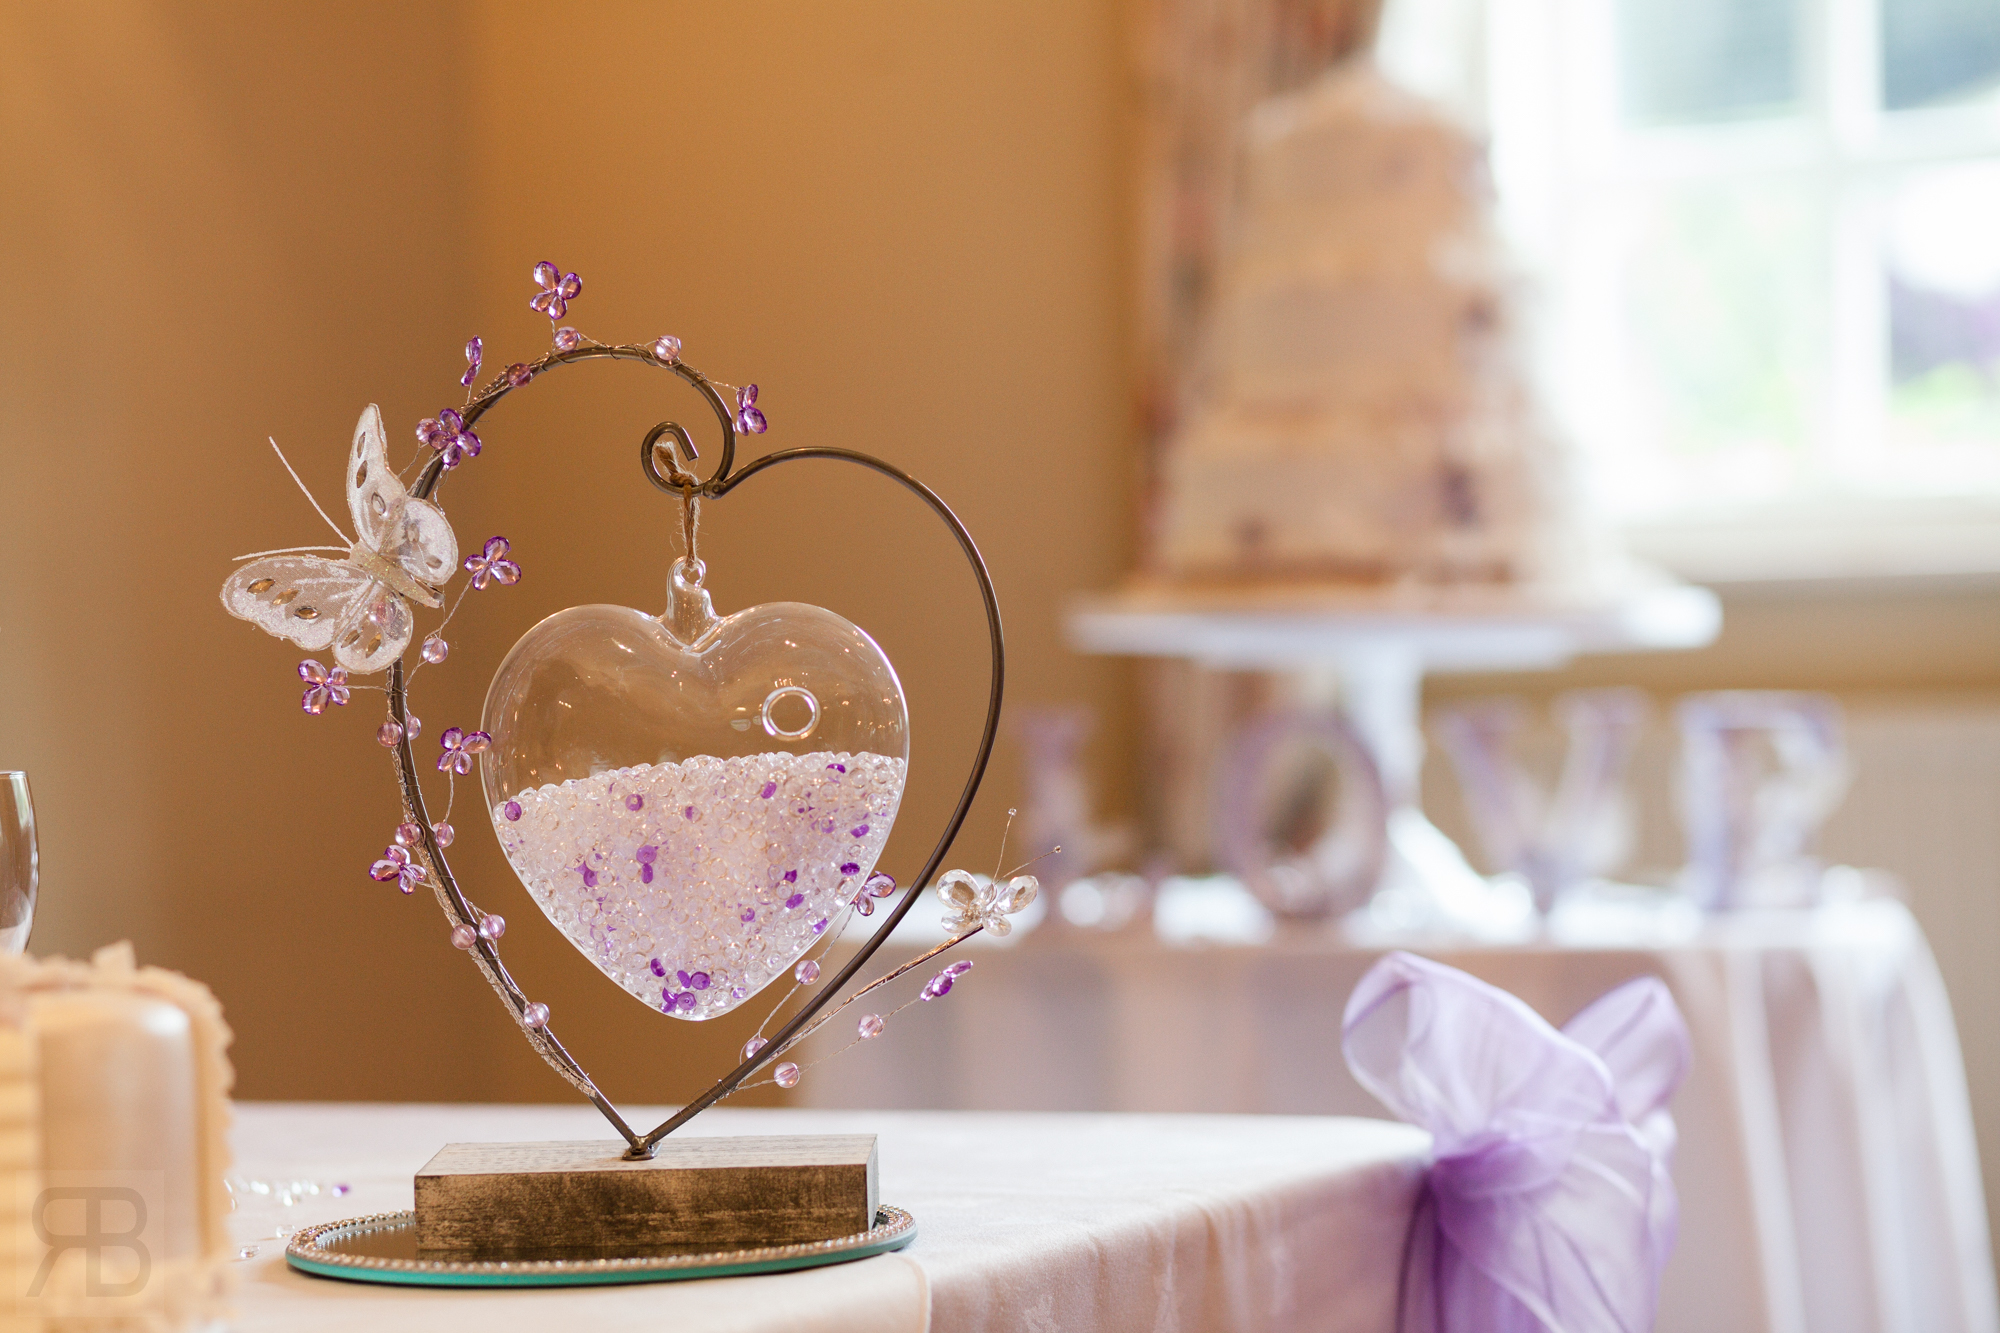 110715_LisaCraigJohnson_Wedding_5428020_WebWM.jpg